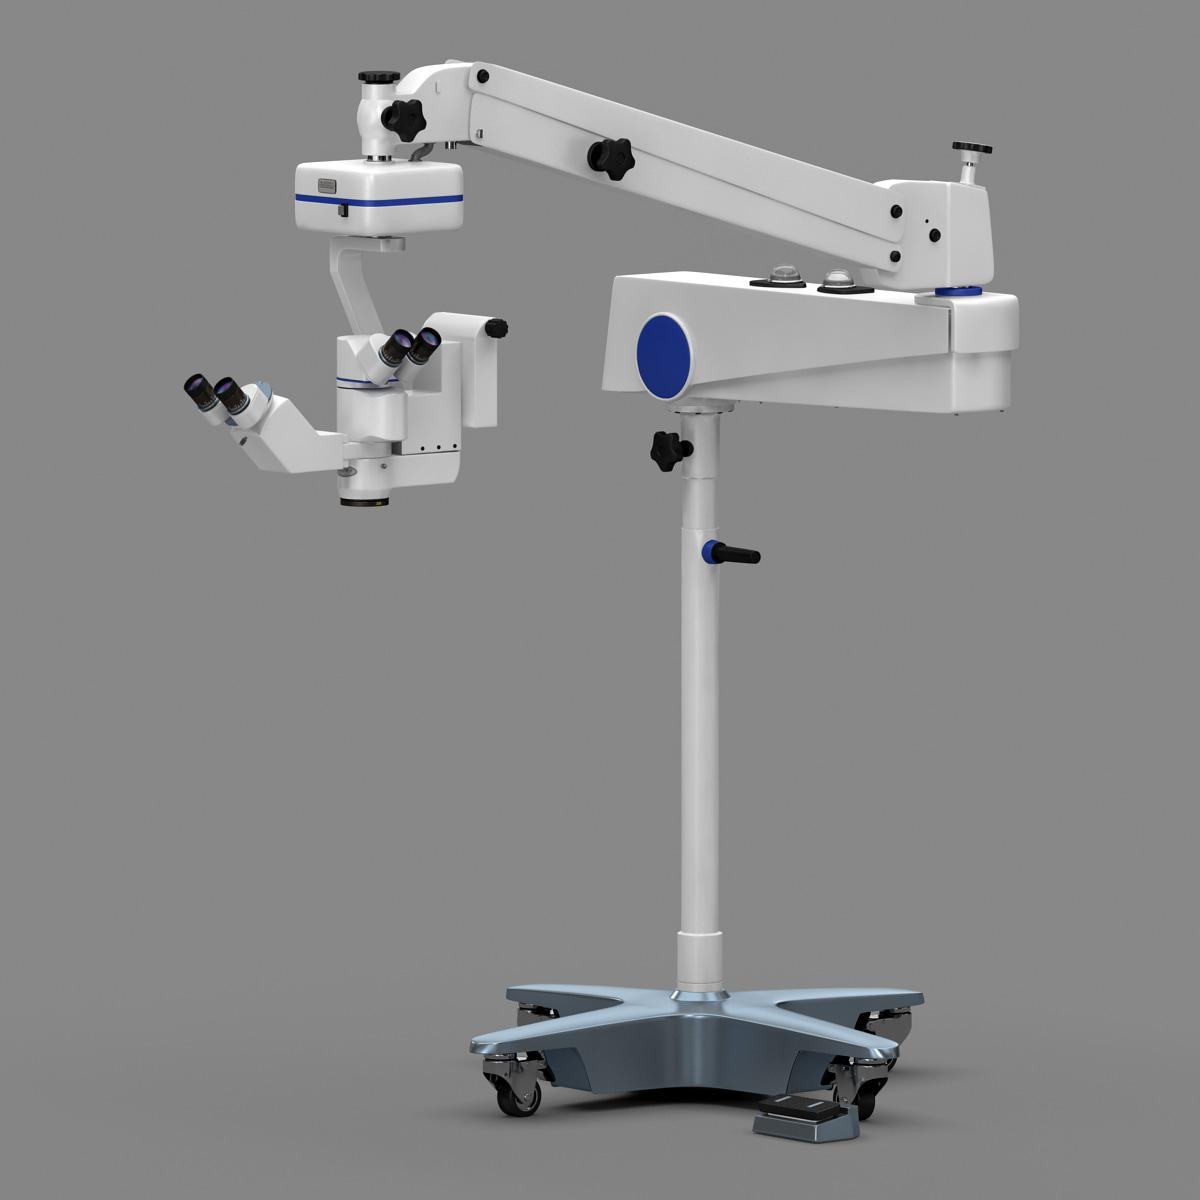 Surgical_Microscope_Asom_4_Series_01.jpg